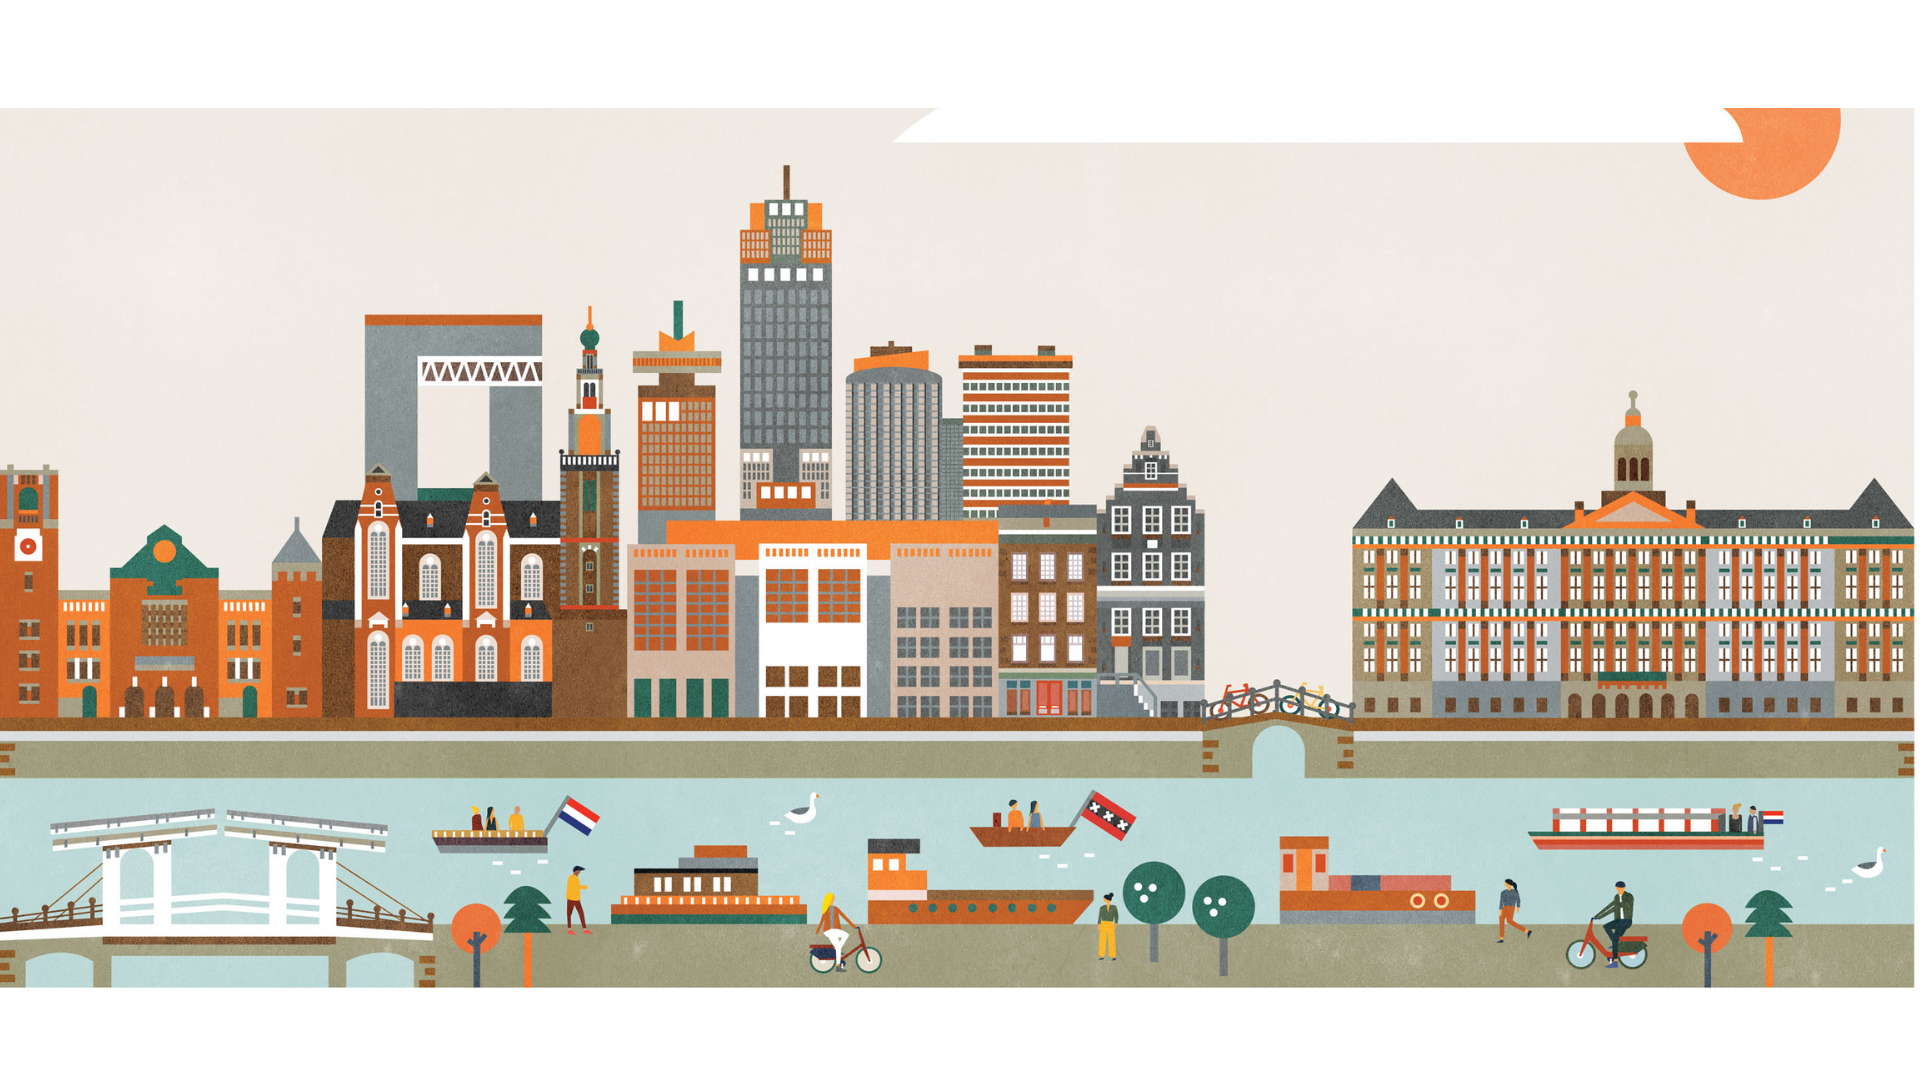 Amsterdam'a ait bir çizim görseli.